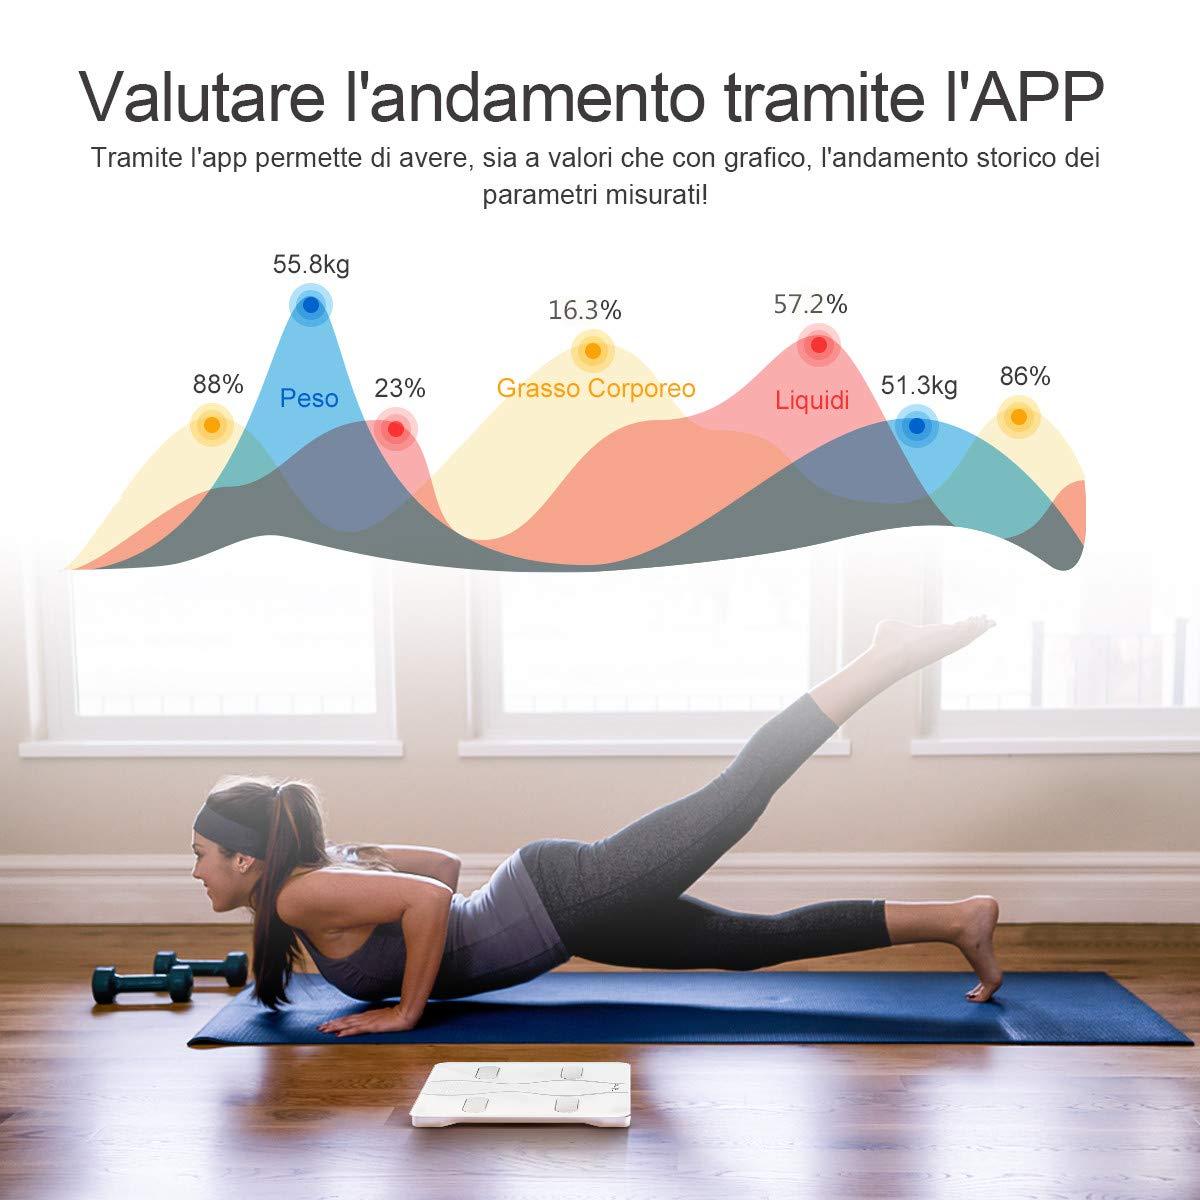 iteknic bilancia impedenziometrica  Bilancia Impedenziometrica iTeknic Bilancia Pesapersone ...